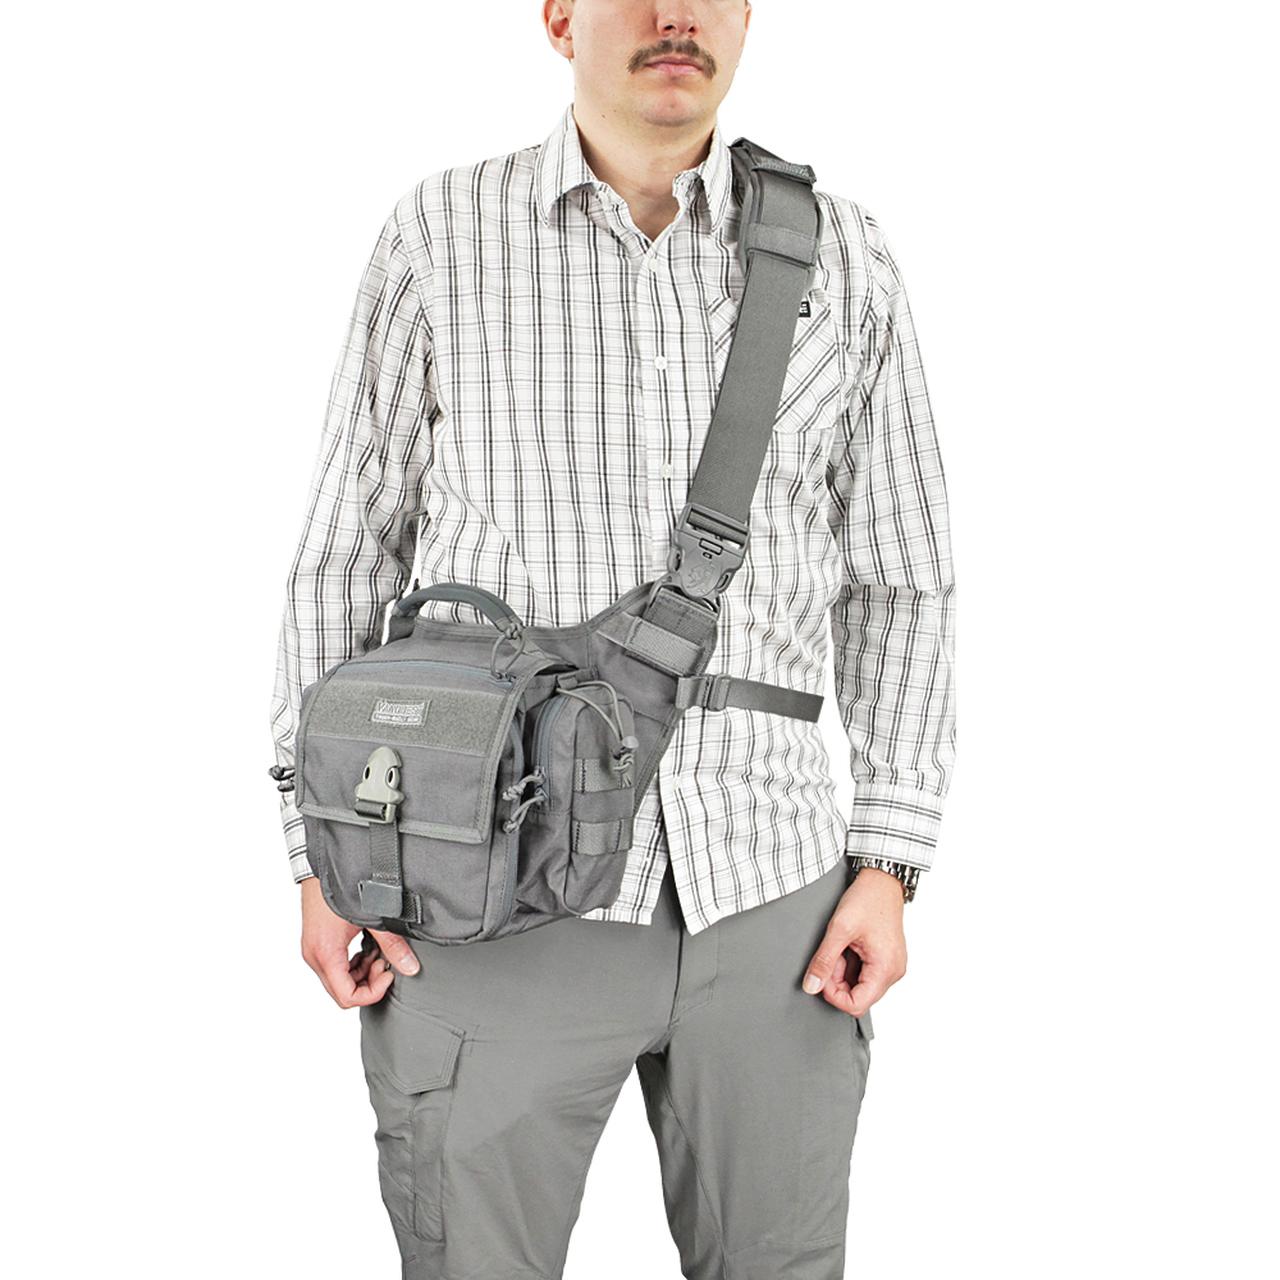 Túi VANQUEST TOLCAT 2.0 VPacker Gear Bag – Black